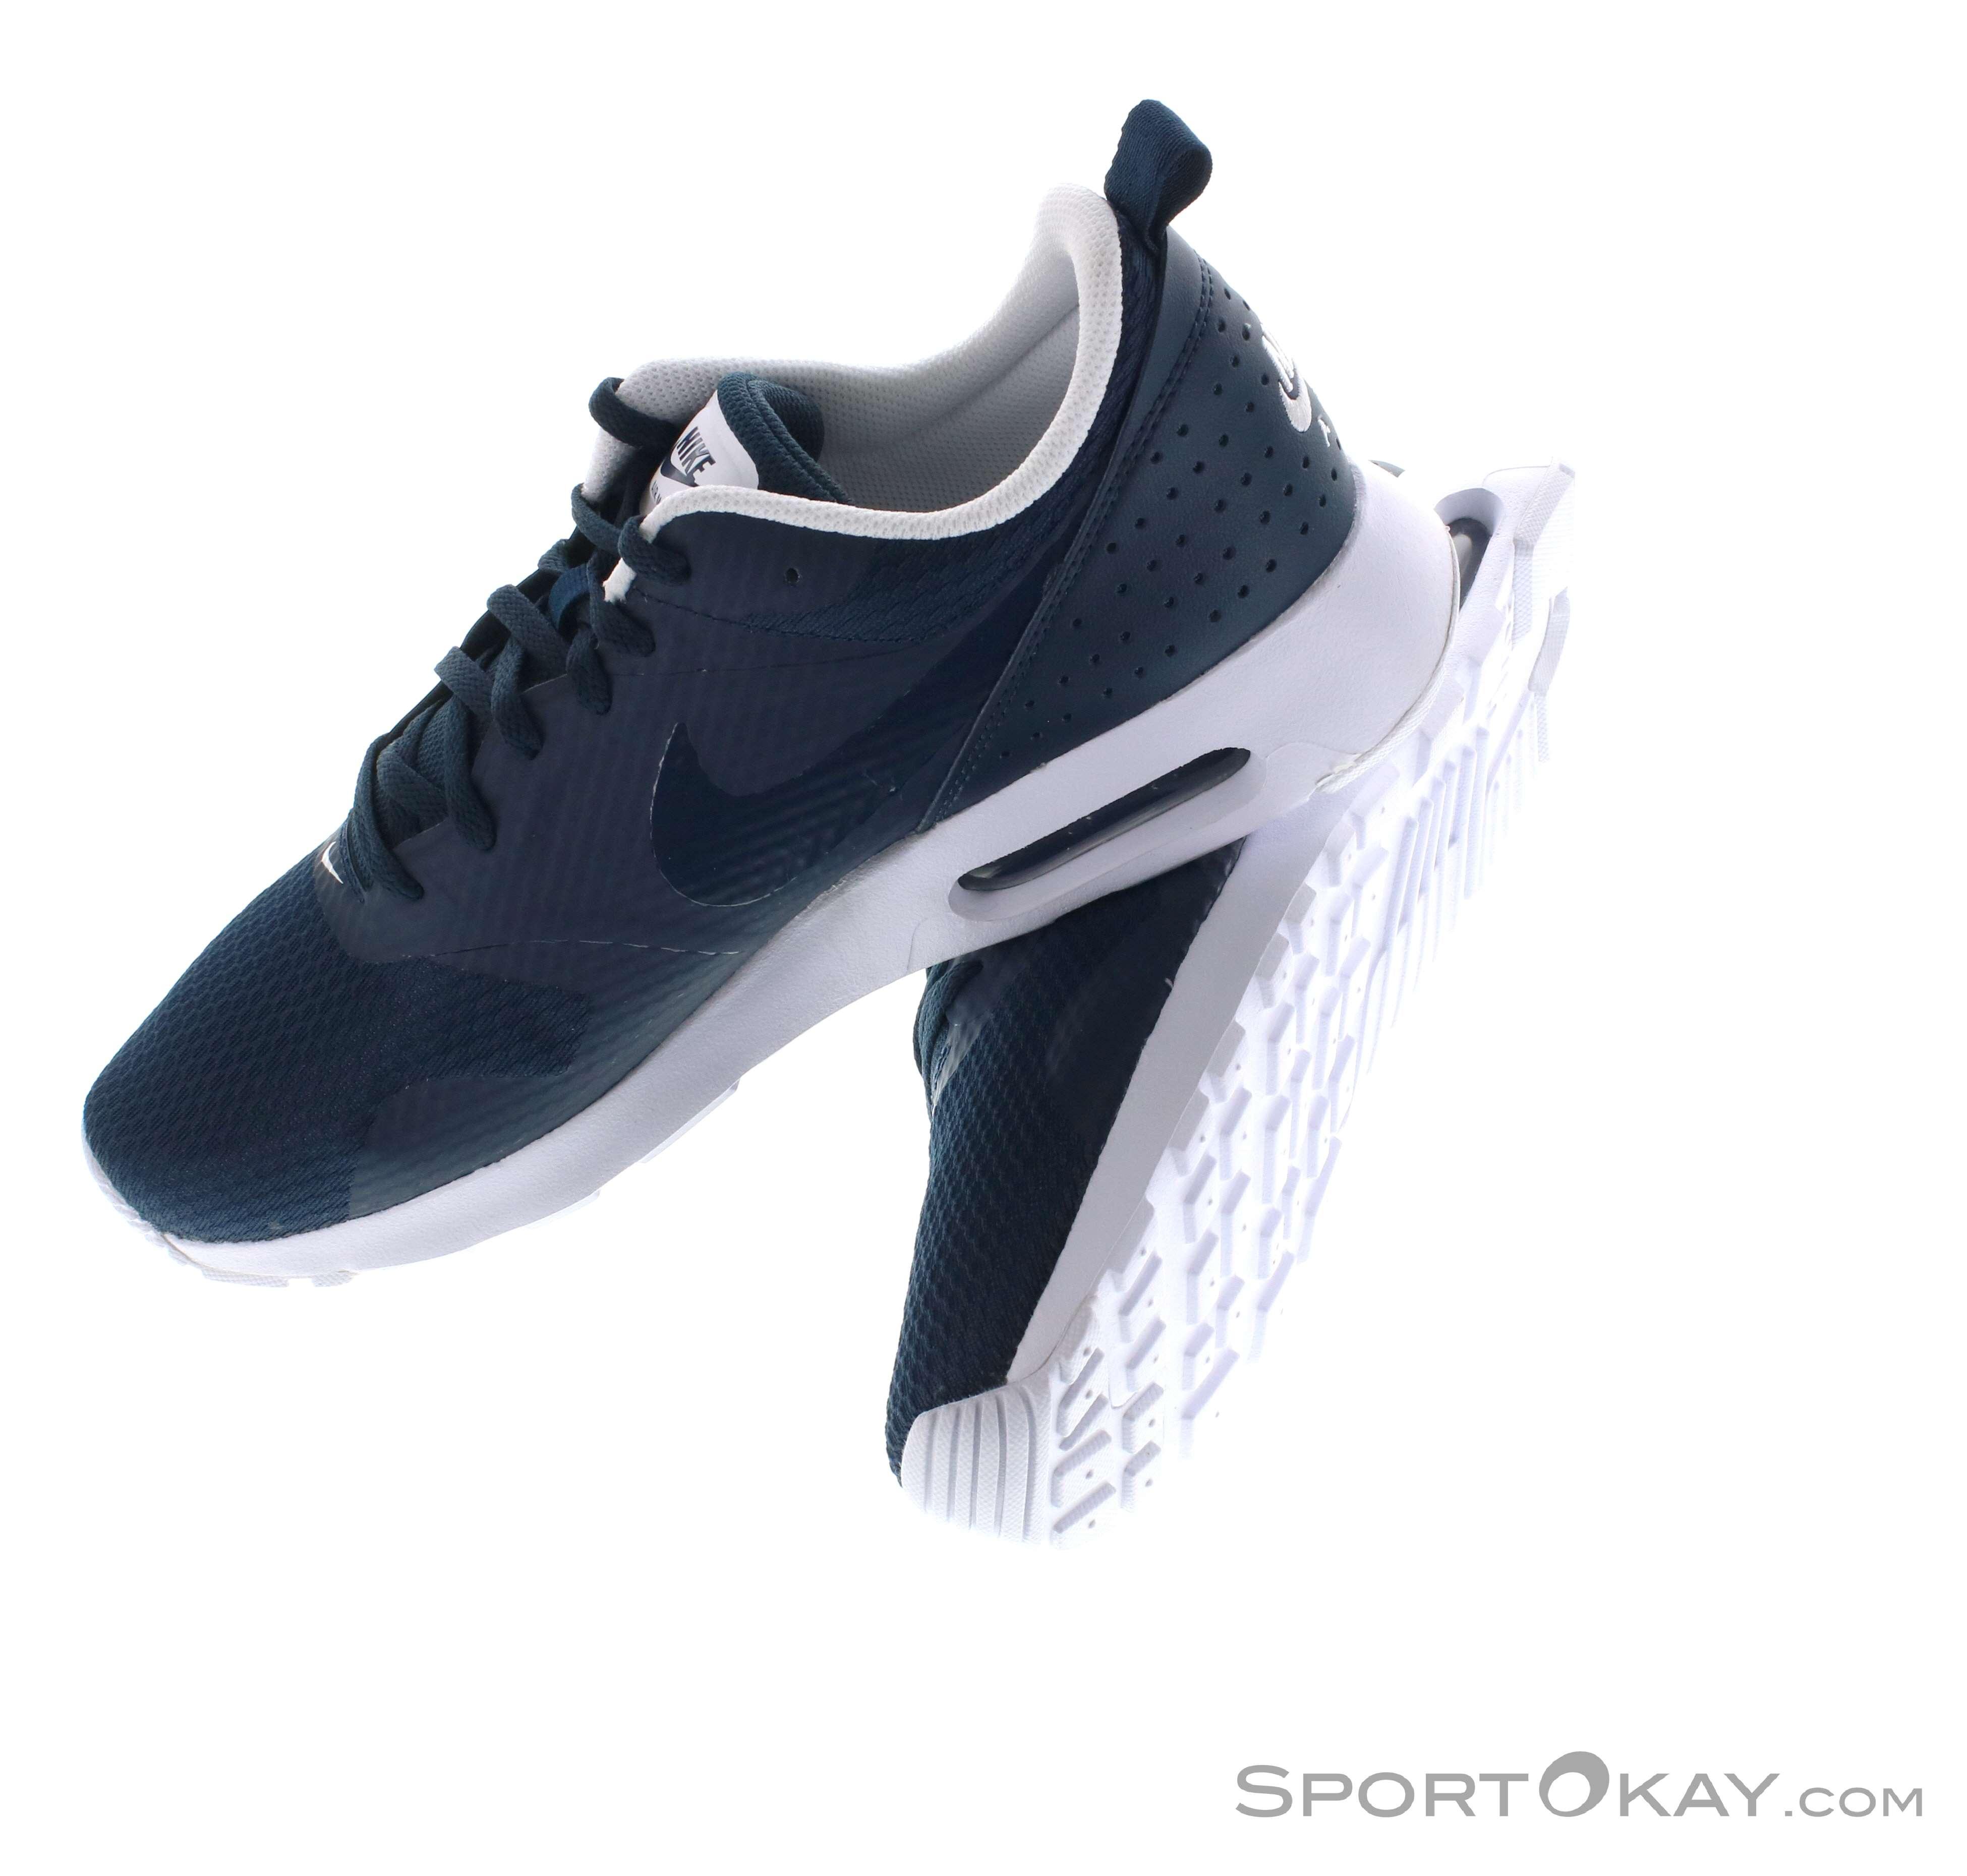 separation shoes 96832 90aeb Nike Air Max Tavas Uomo Scarpe da Corsa, Nike, Blu, , Uomo,